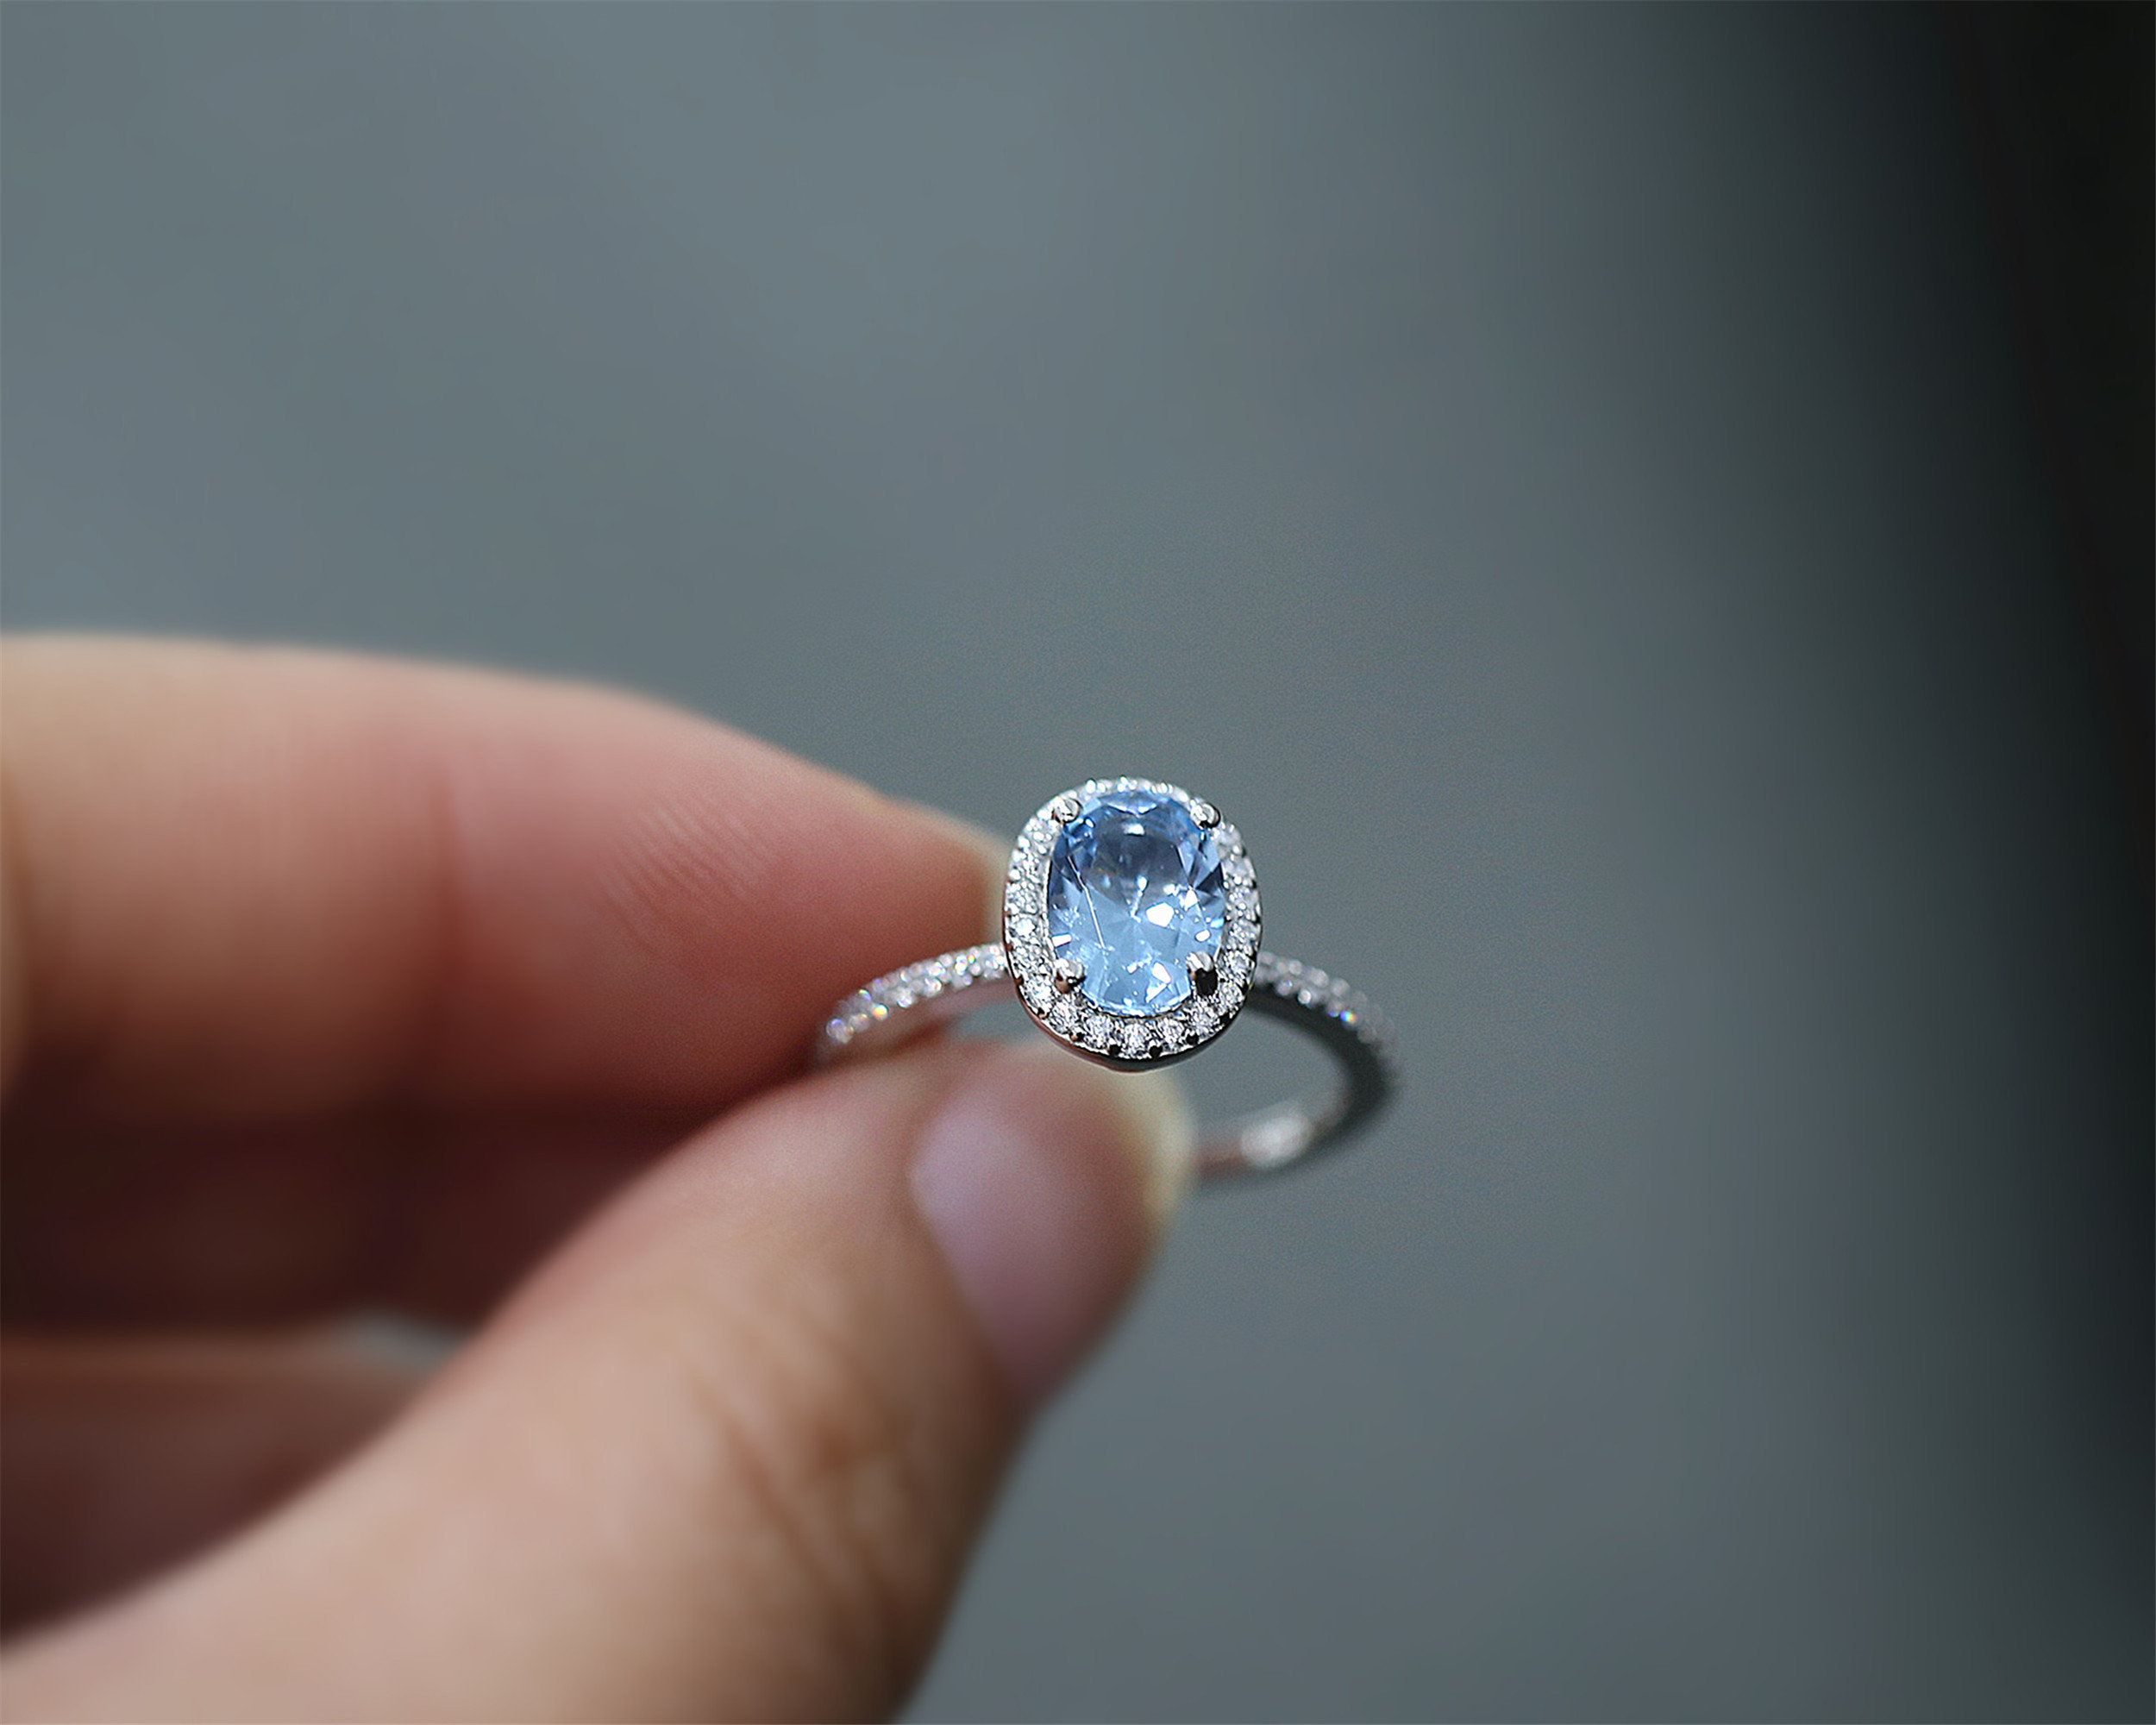 6*8mm Oval Cut Nano Morganite Ring Engagement Ring Sterling Silver Ring Gemstone Ring Bridal Ring